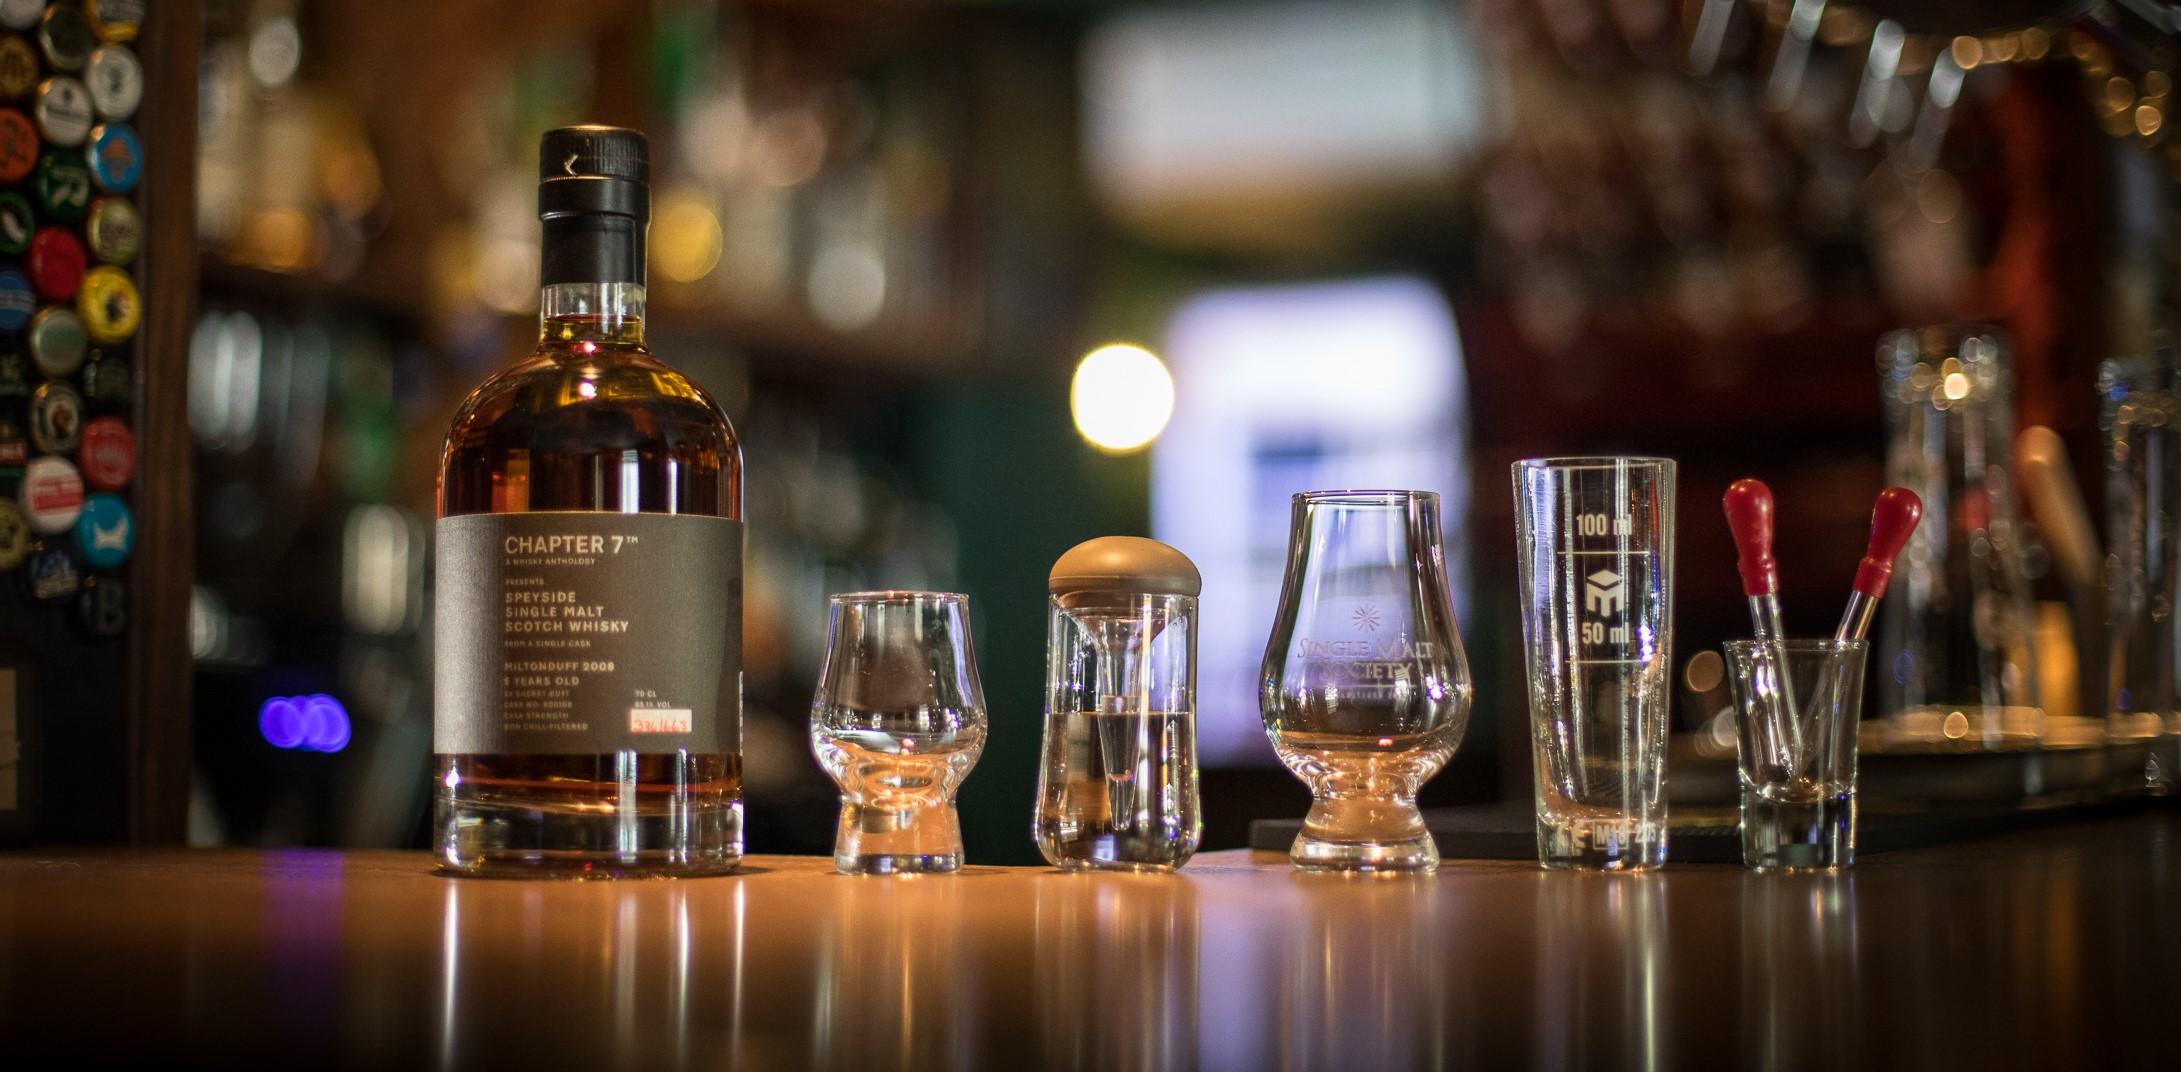 Atelier Cask Strength Whisky, workshop by Single Malt Society